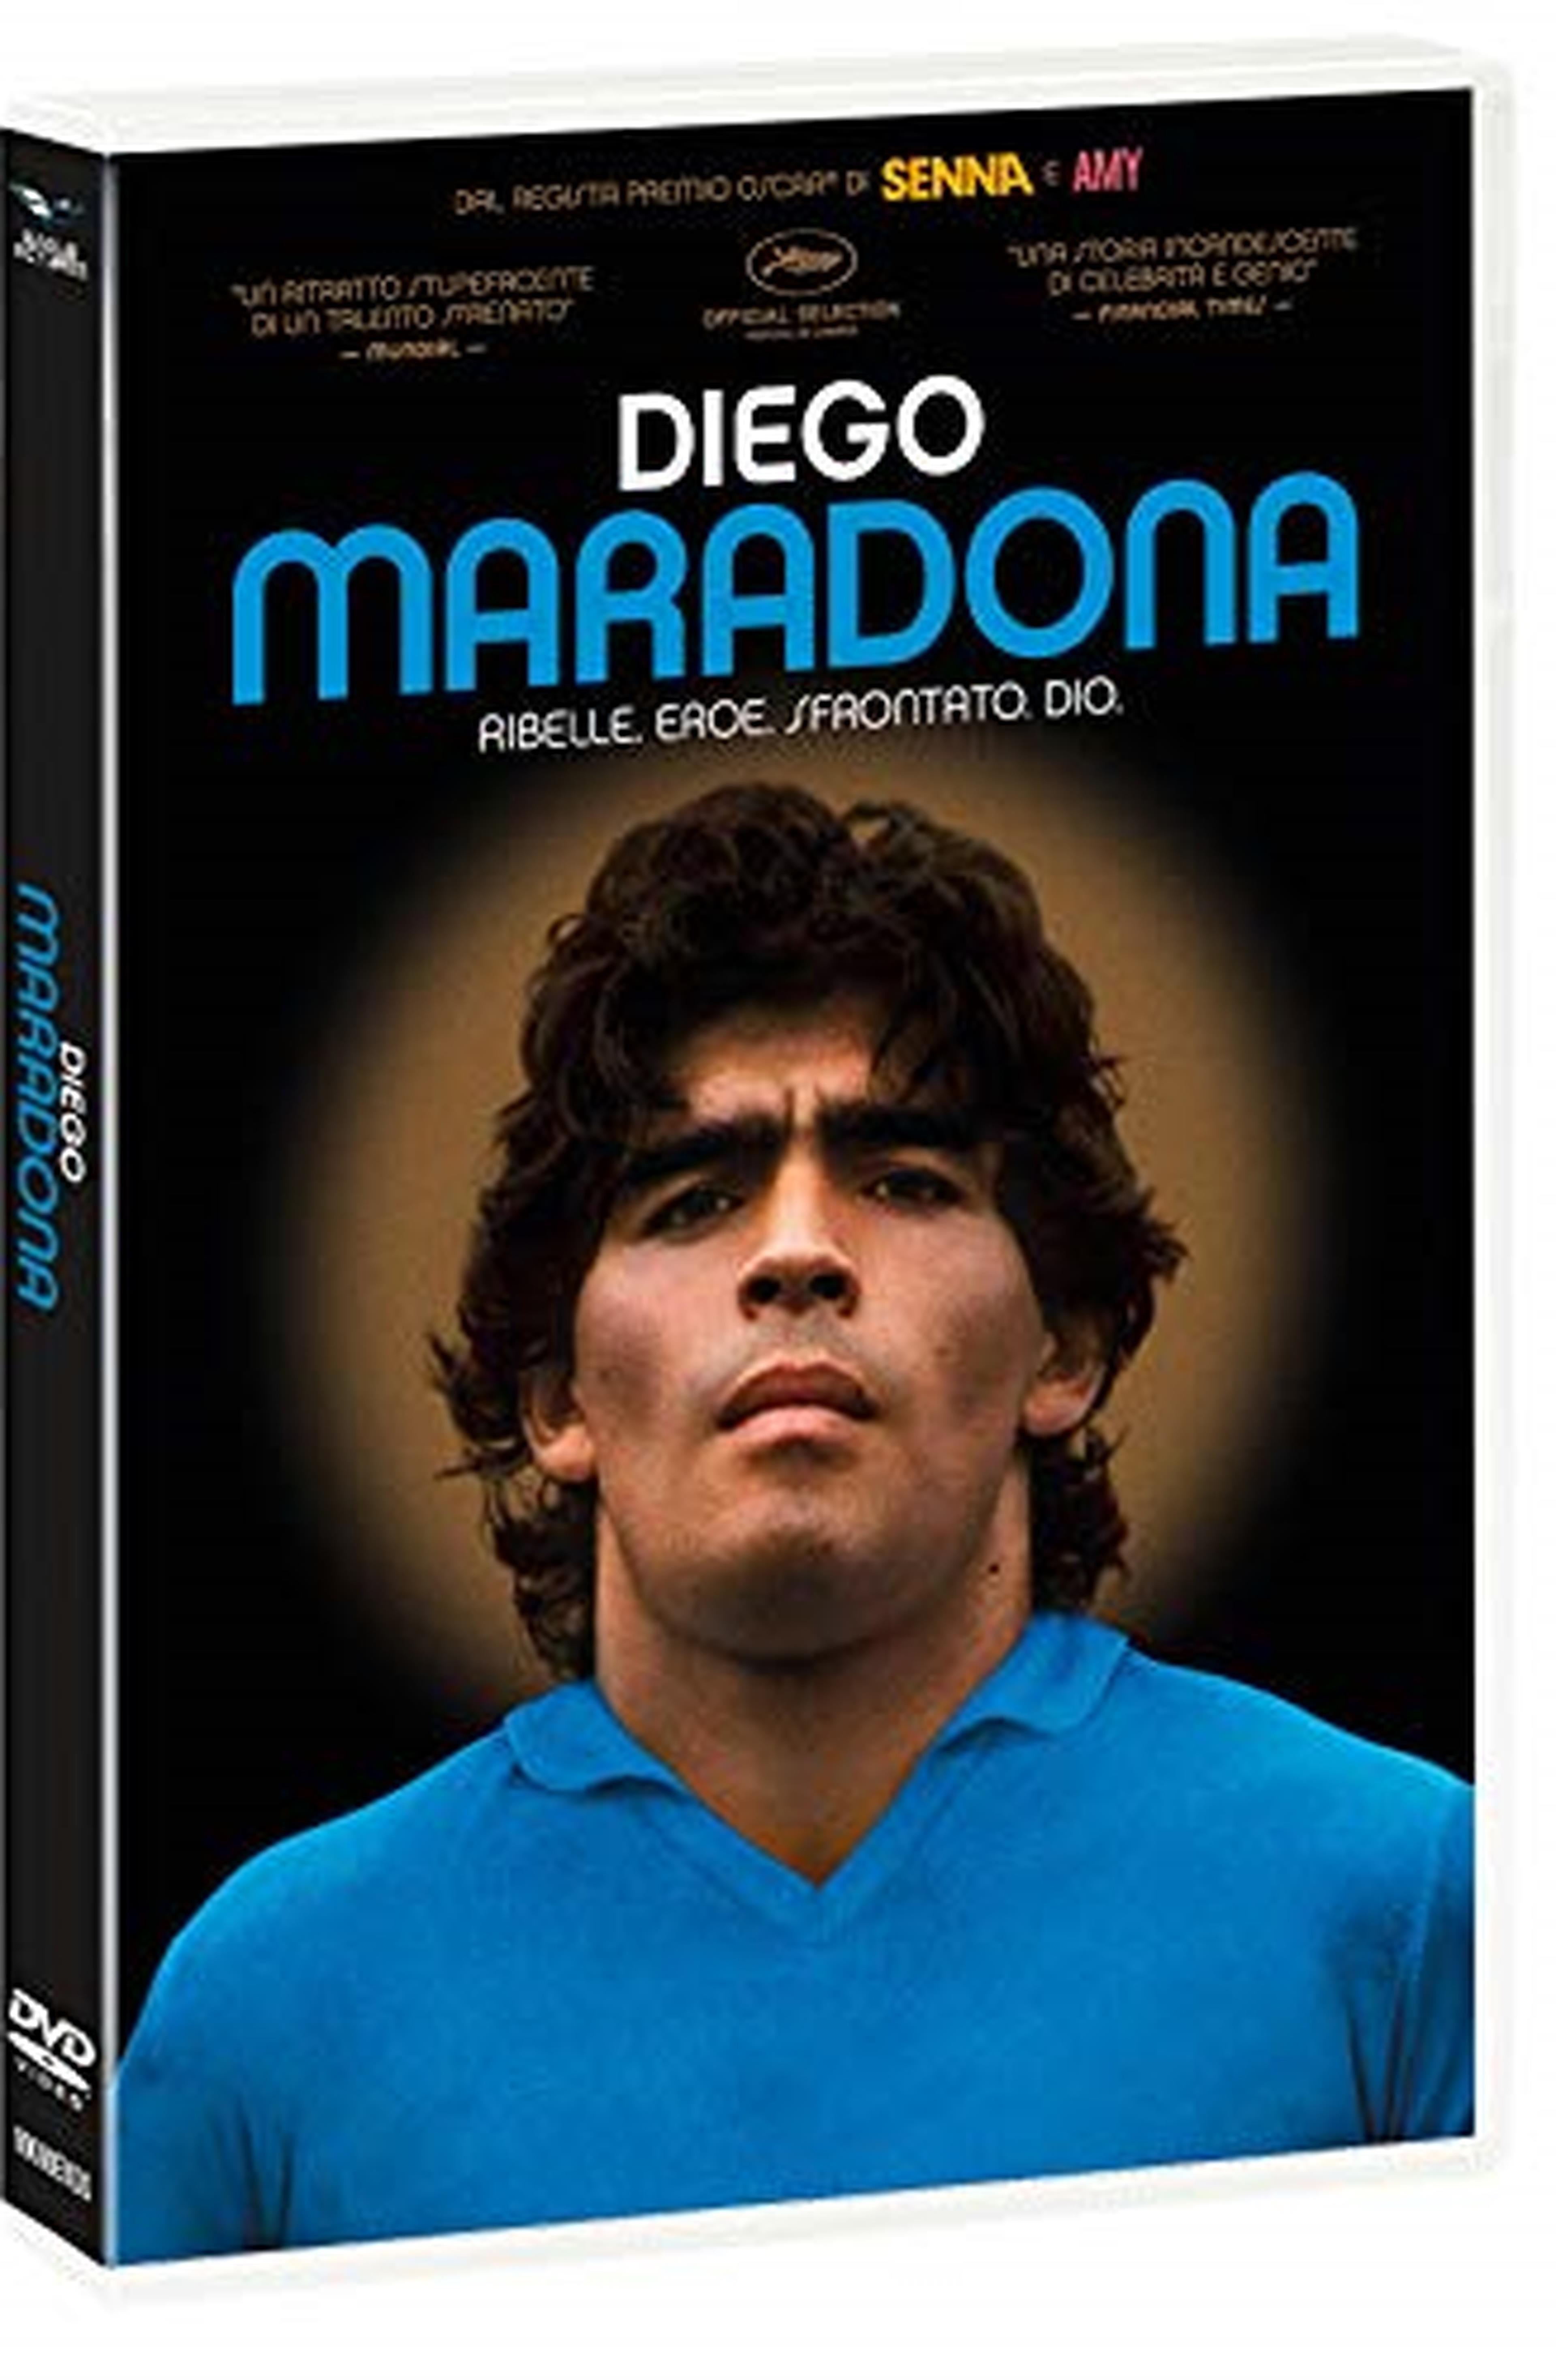 Diego Maradona (Box 2 Dv)+ Booklet + Card